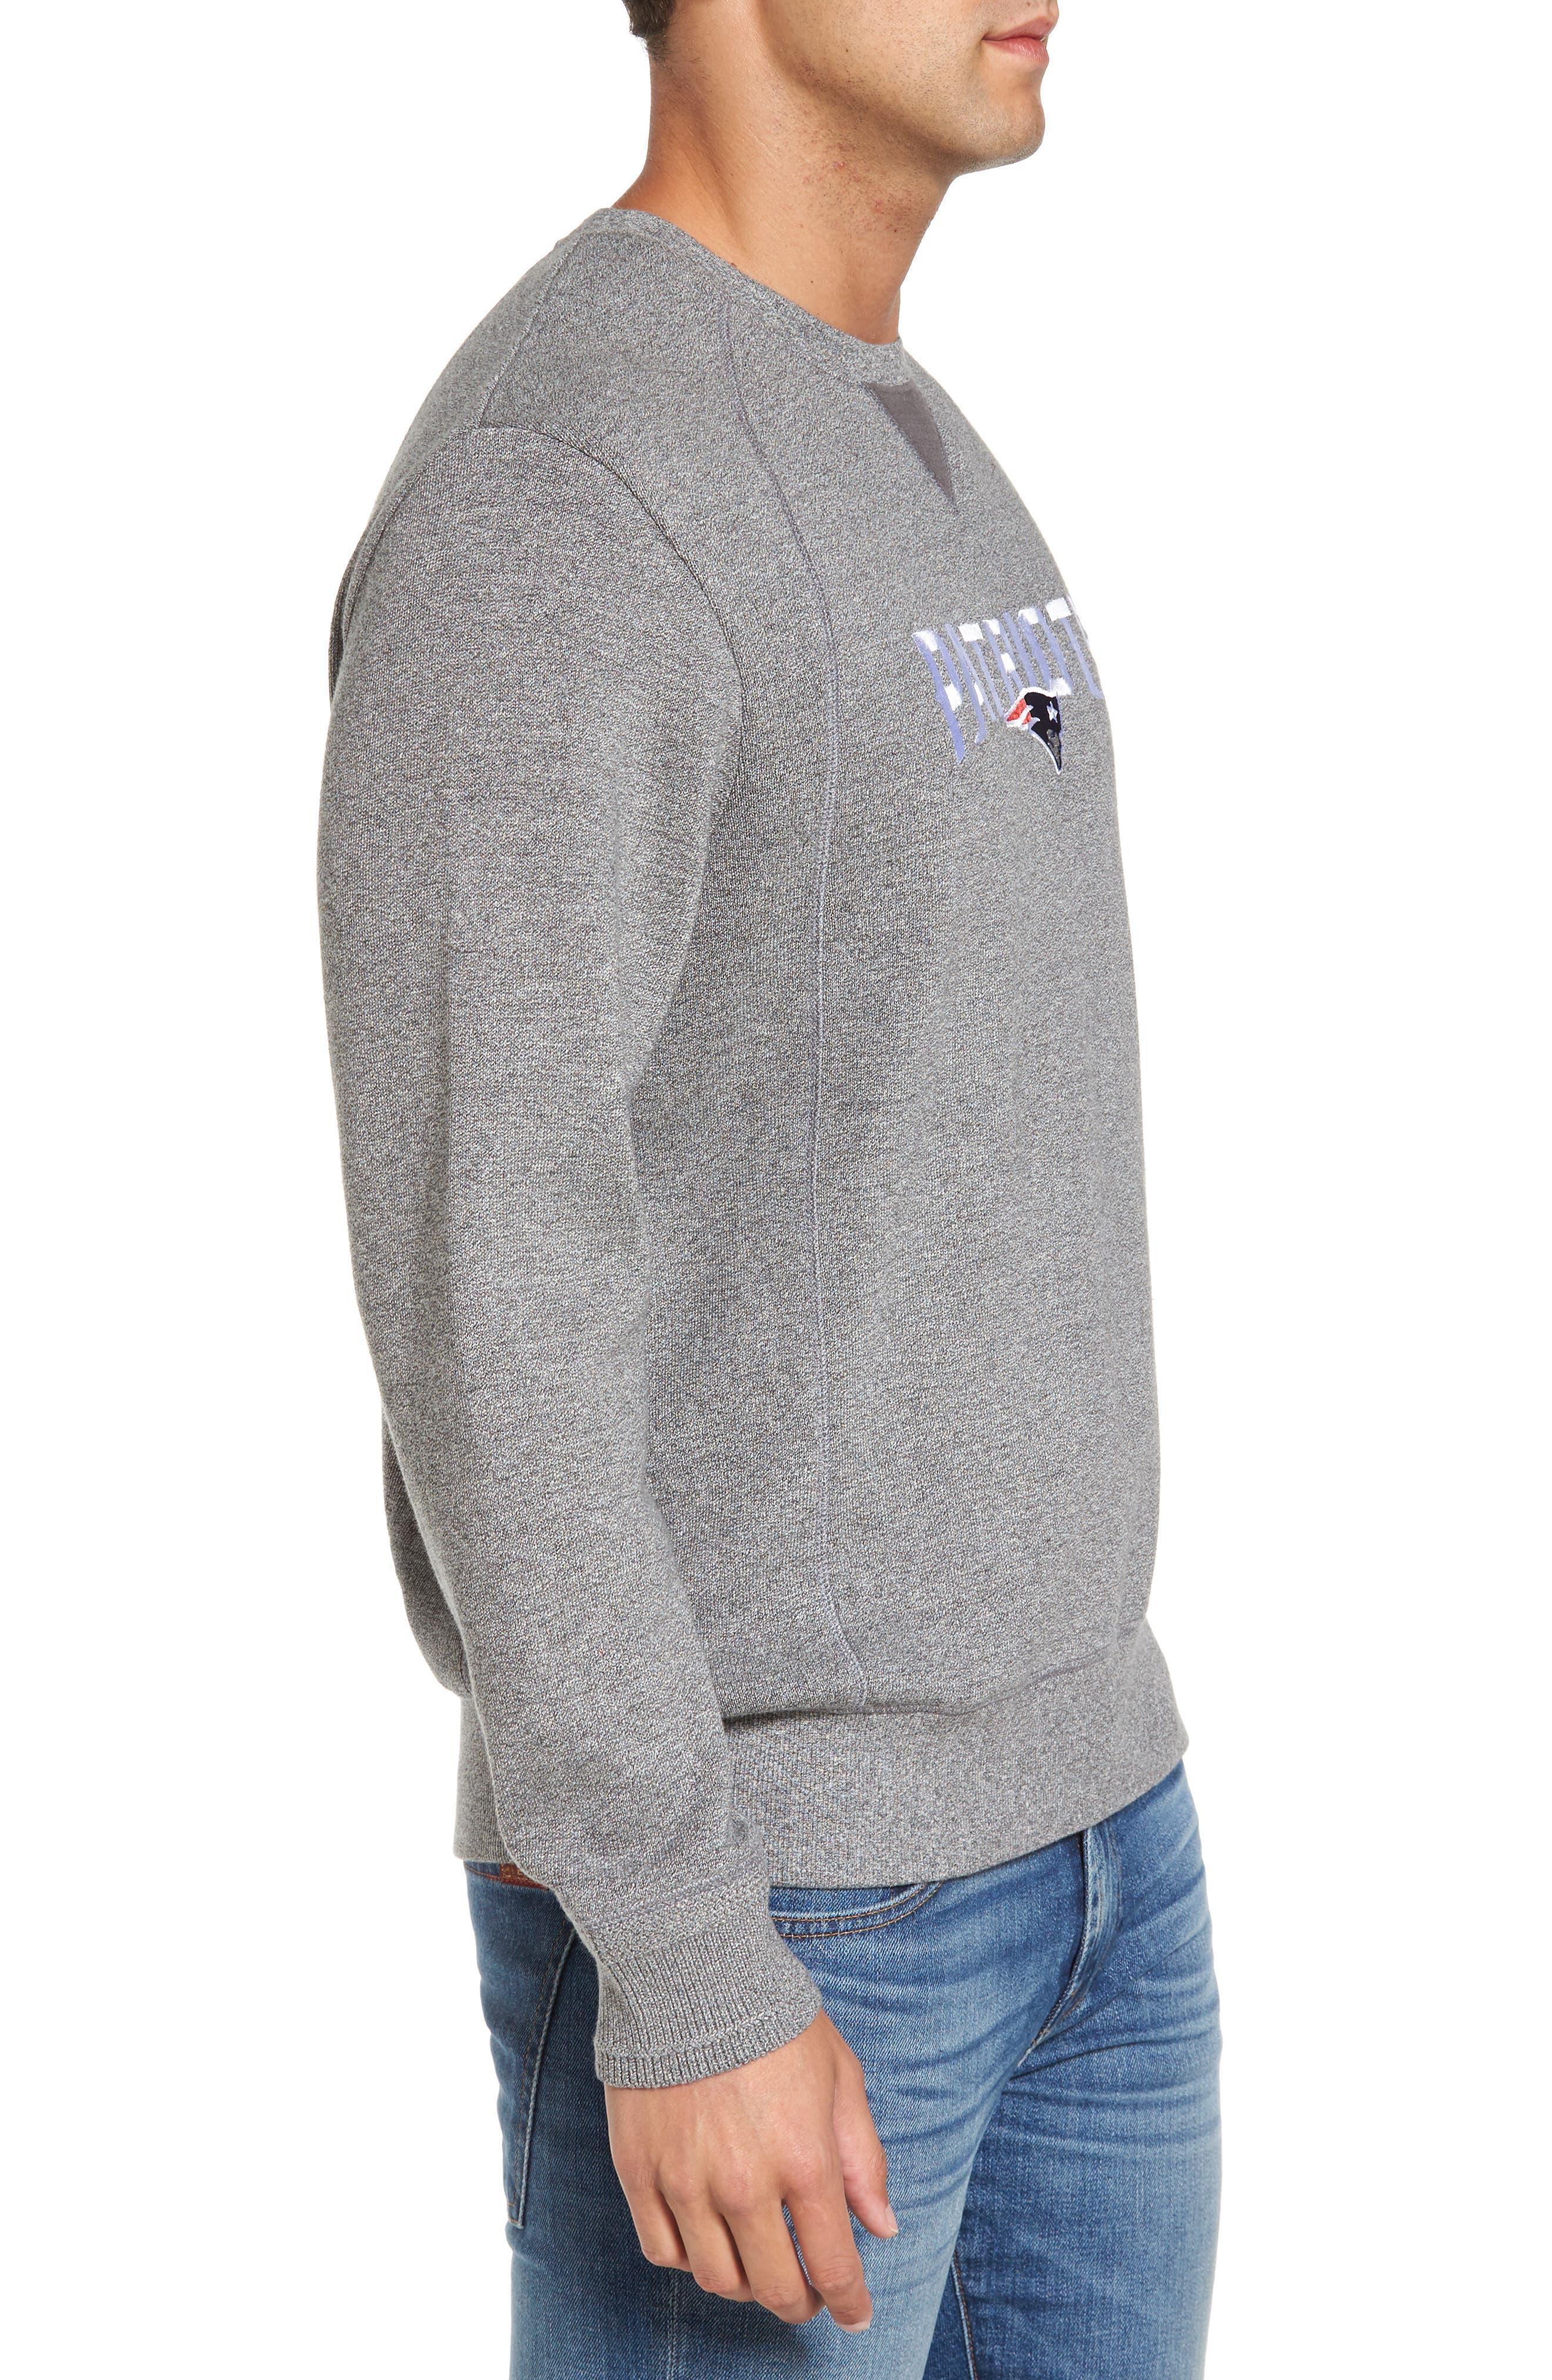 NFL Stitch of Liberty Embroidered Crewneck Sweatshirt,                             Alternate thumbnail 84, color,